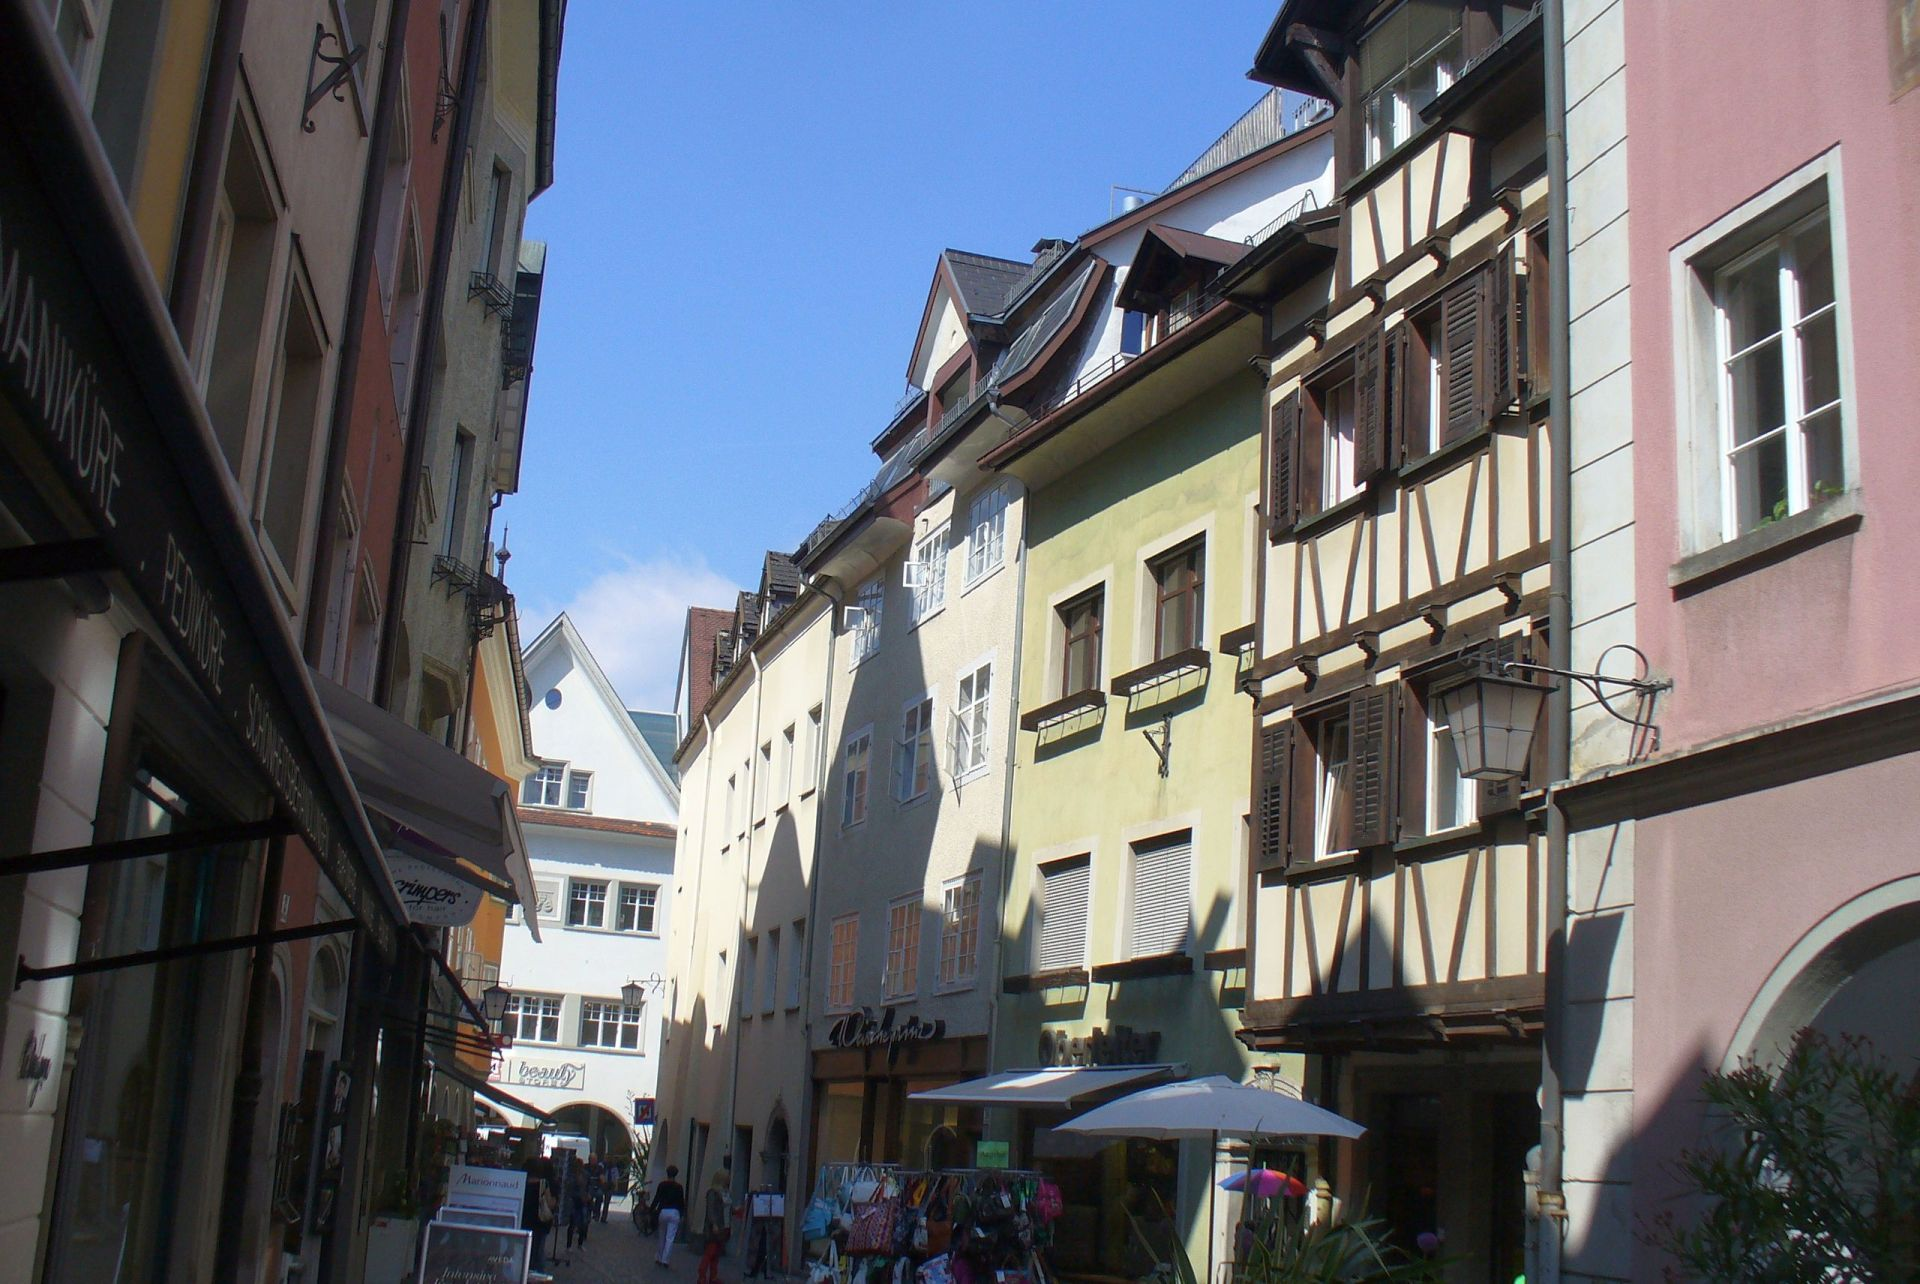 Feldkirch - Autriche